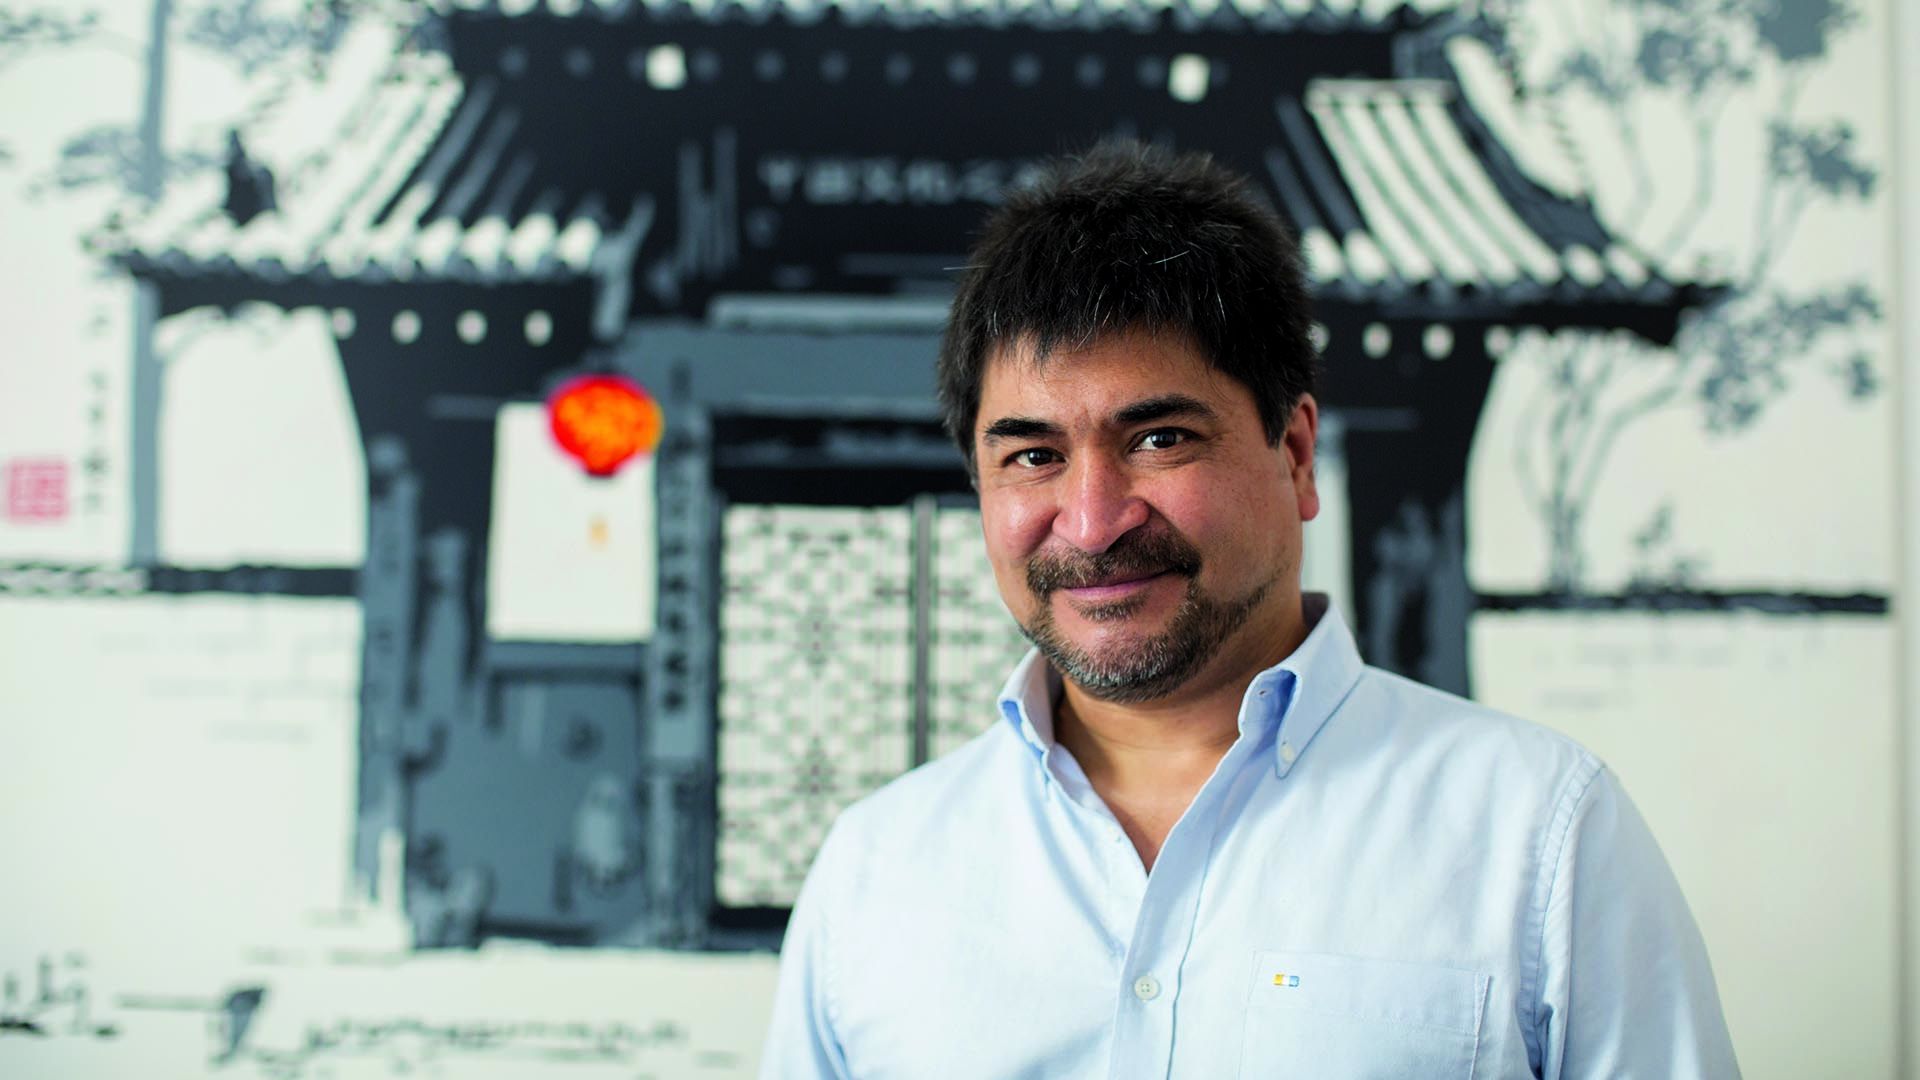 #PARA TI - HOROSCOPO CHINO GUSTAVO NG - APERTURA - News - AI